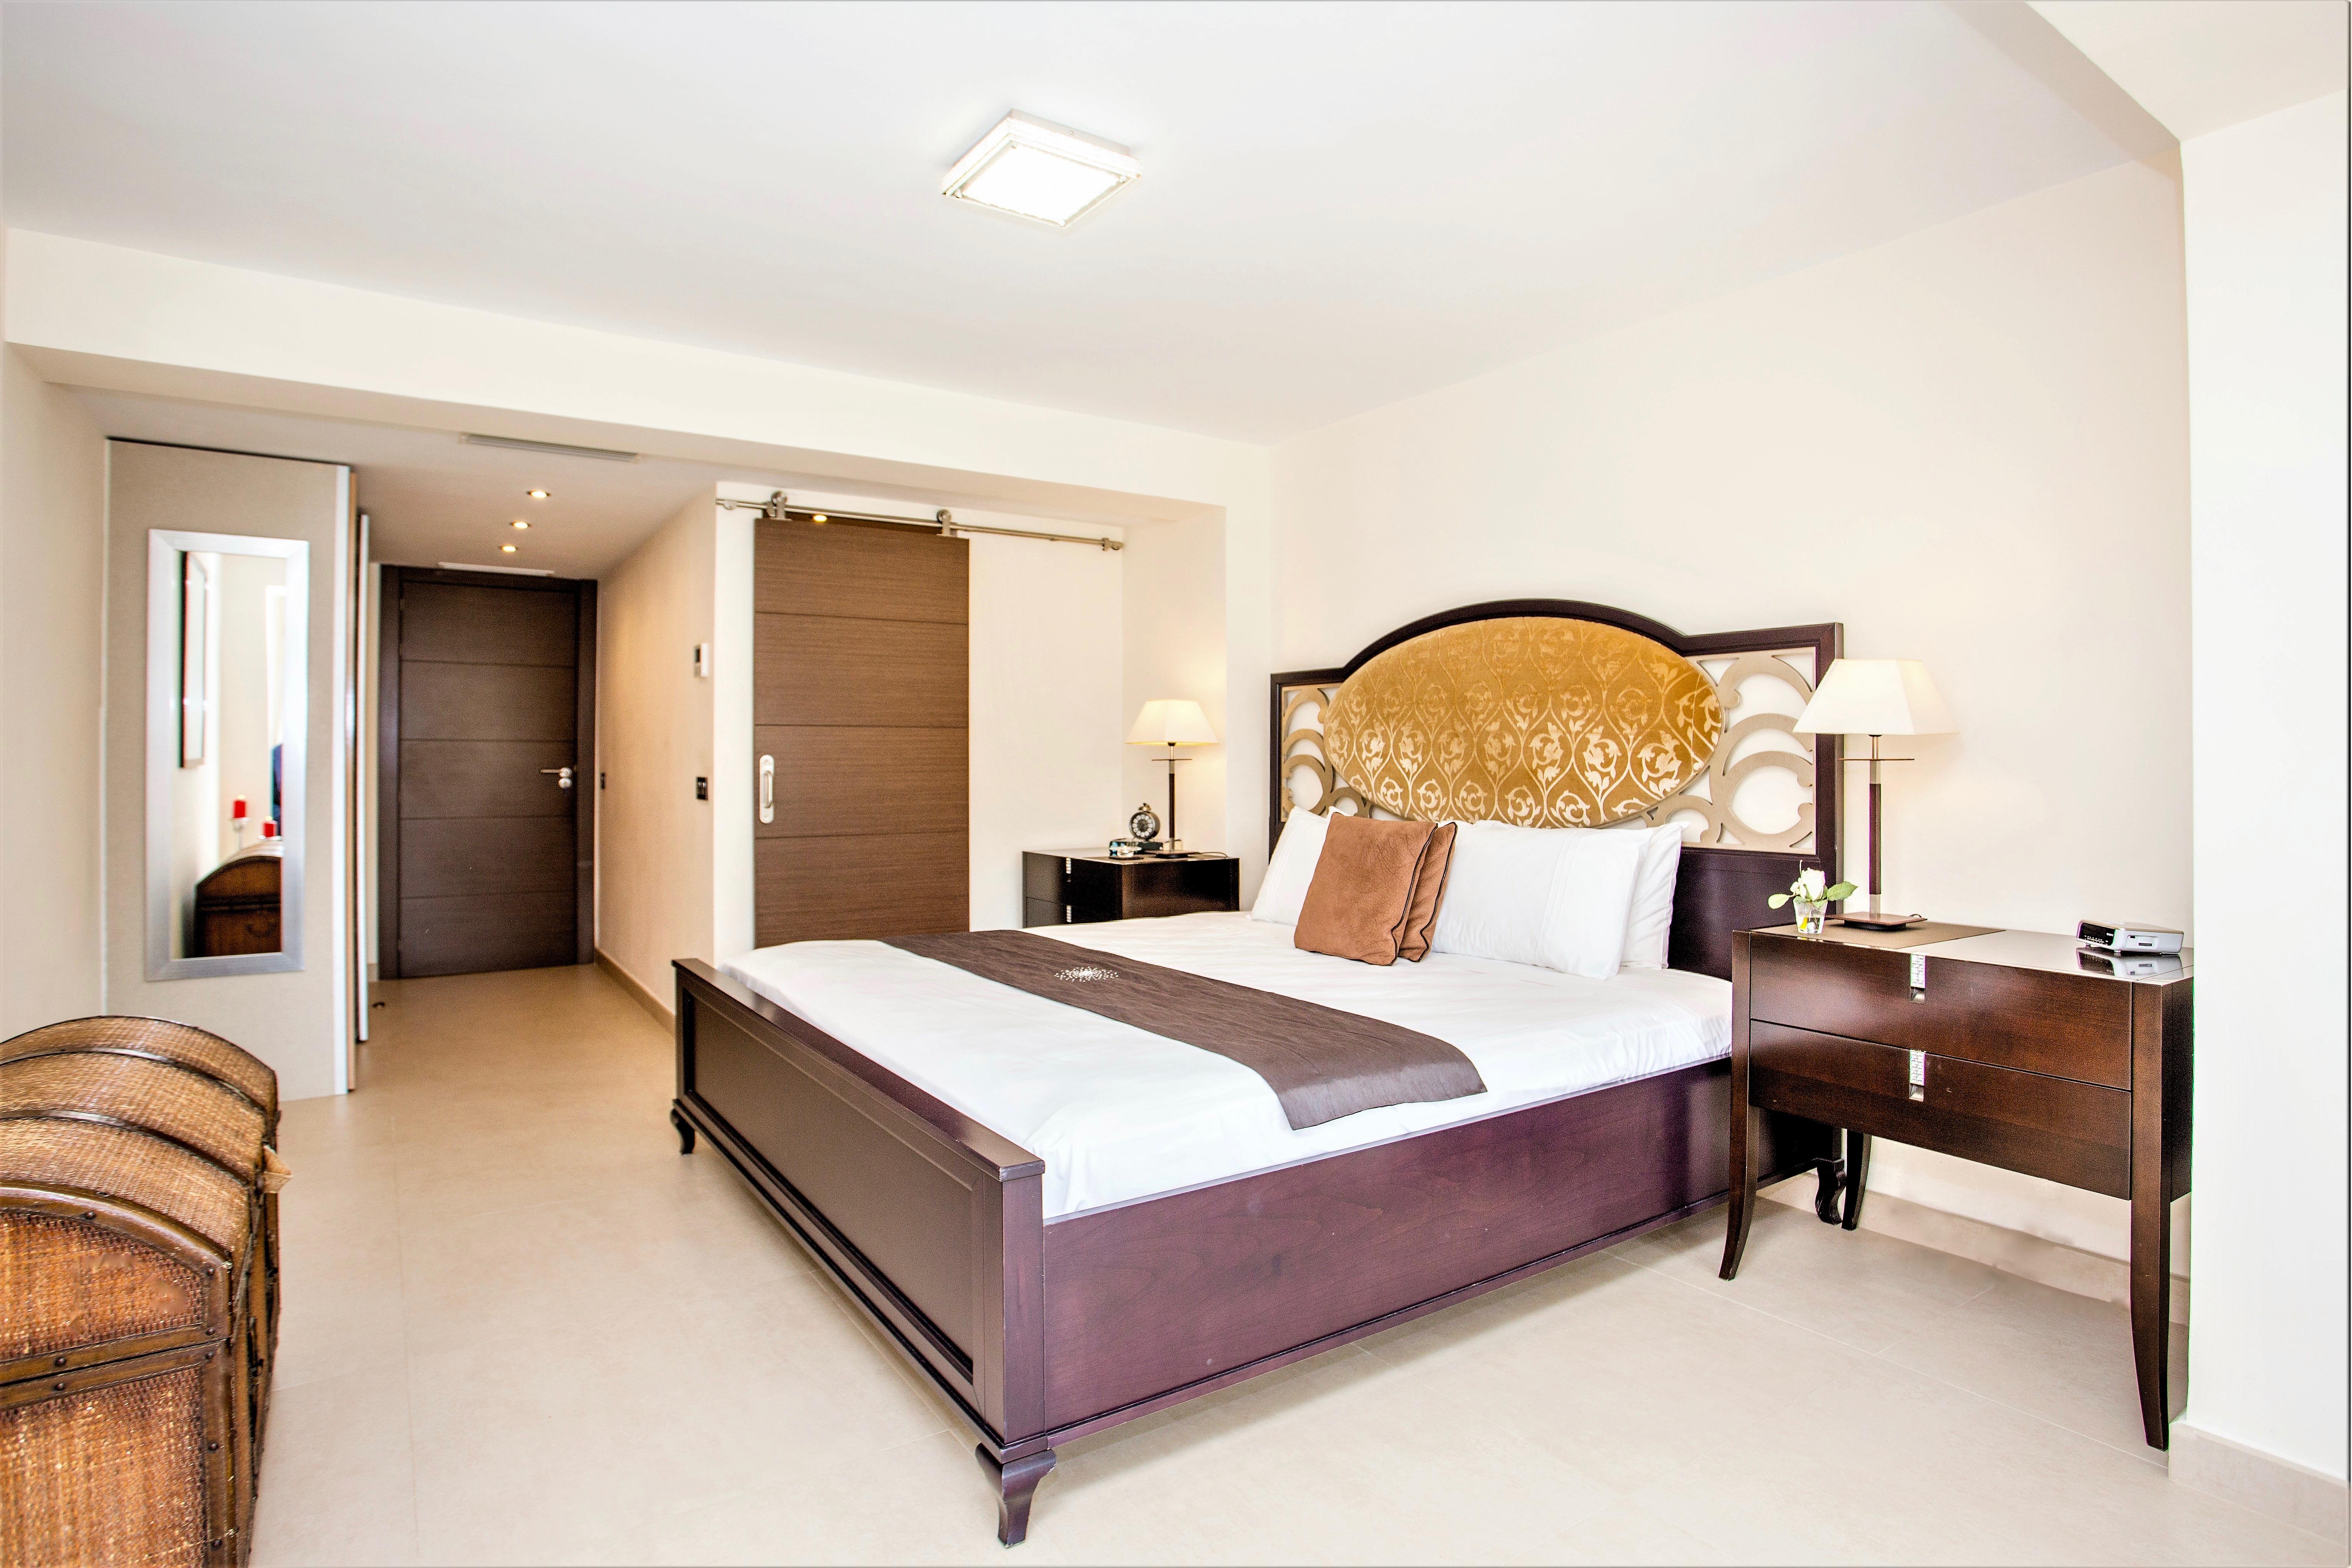 Apartment 4 B R  VILLA by Puerto Banus   Sea 5 m                                photo 20147464